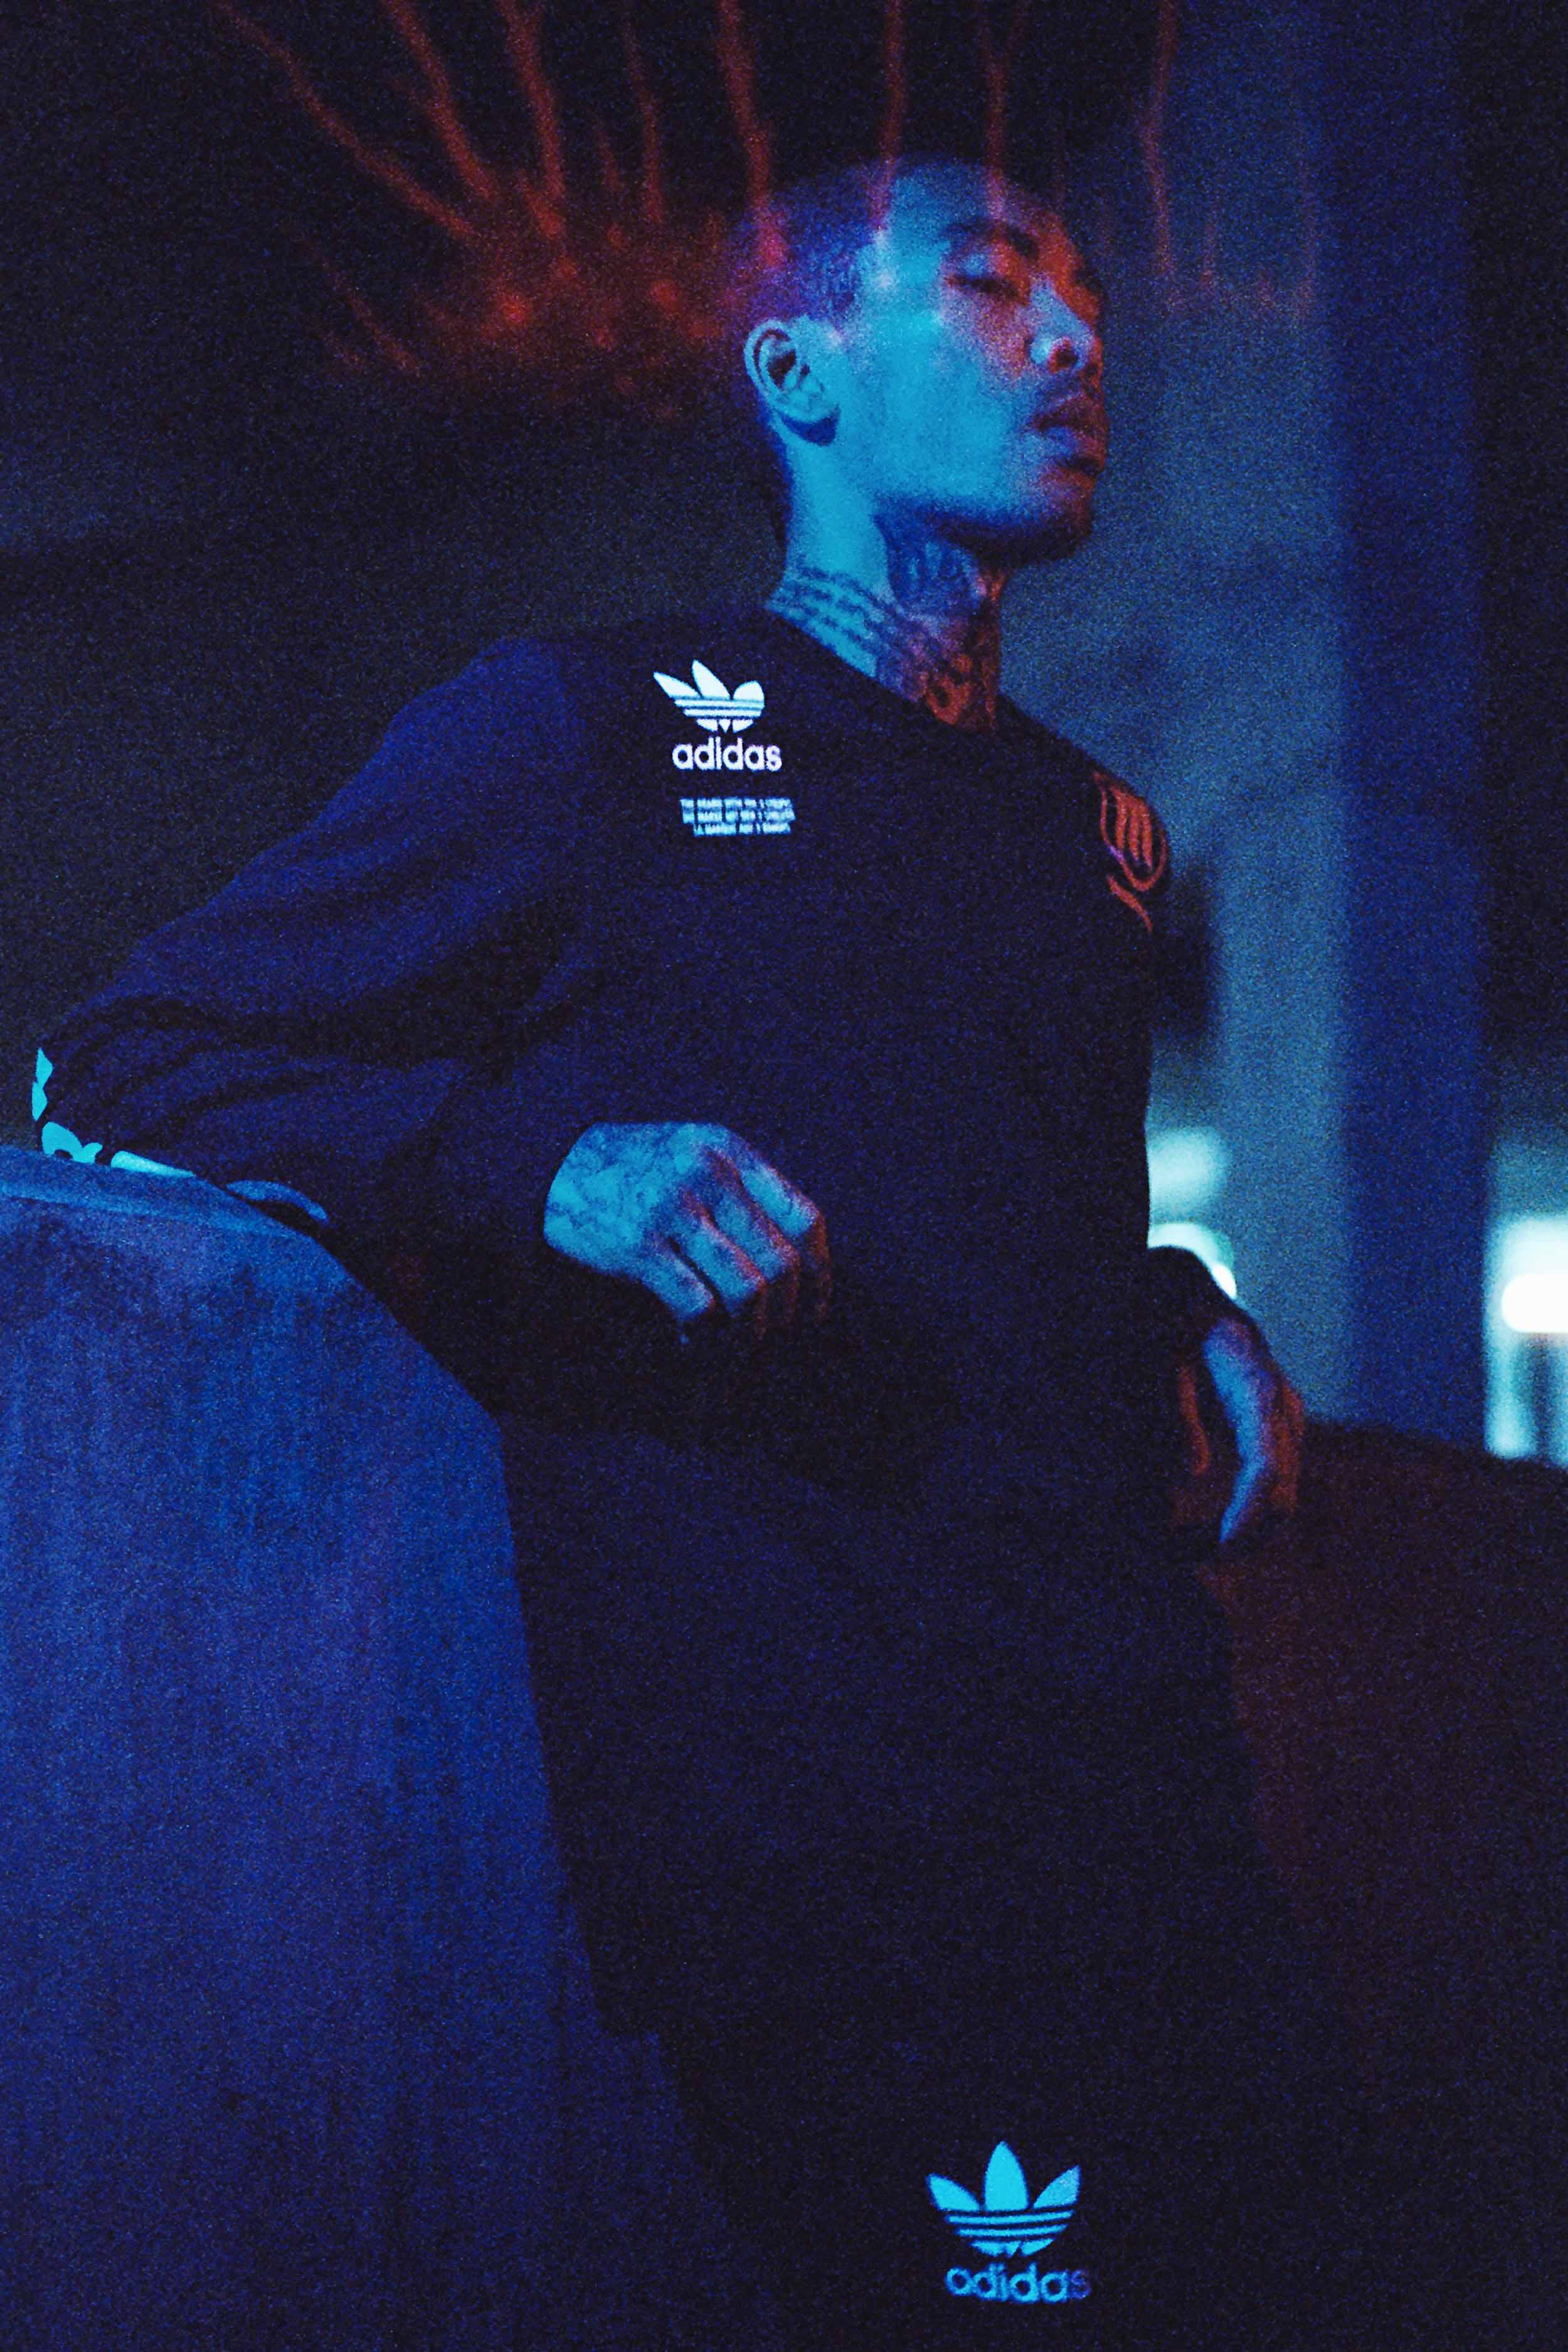 adidas-Originals-by-NBHD_07